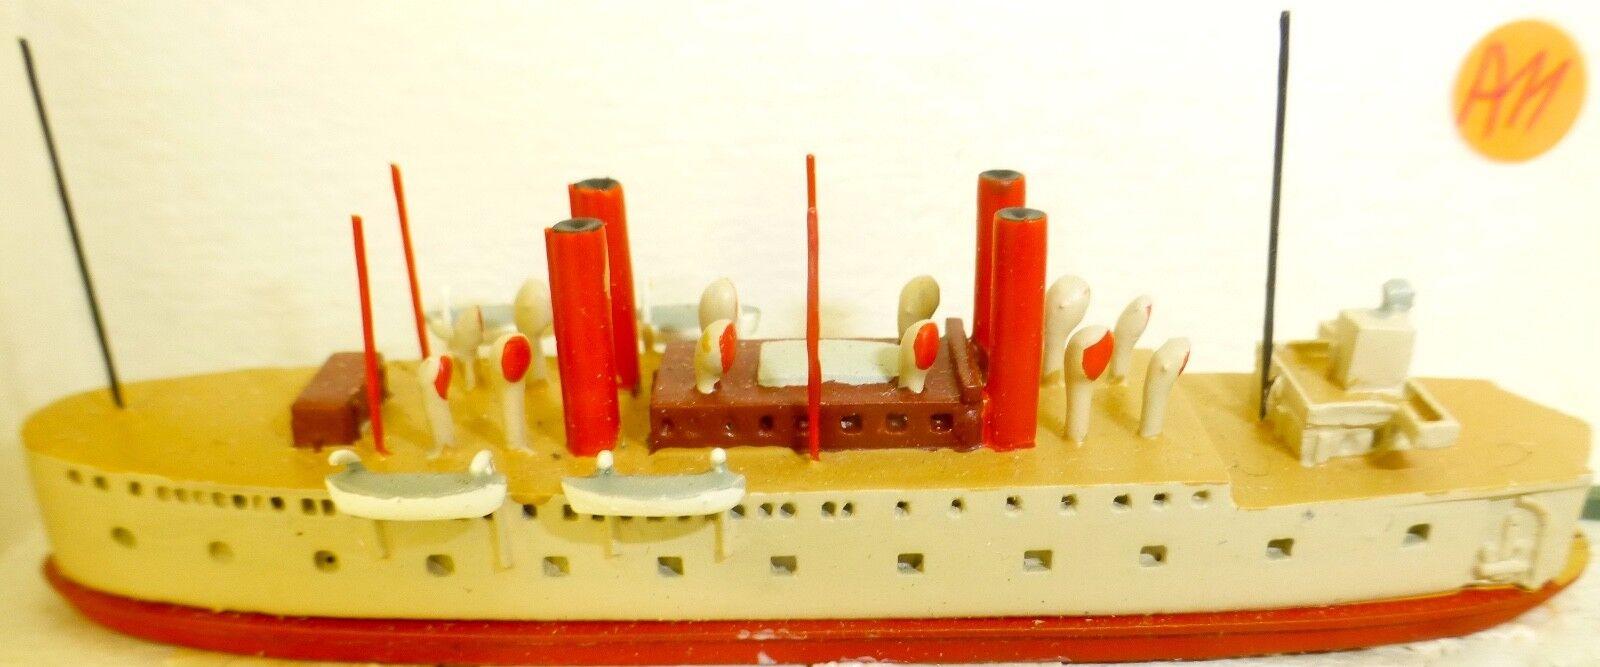 Steamship Steamship Steamship Submarine Transport Railway VG15 Ba 1 Kal Ship Model 1 1250 SHPA11 Å bf16a0